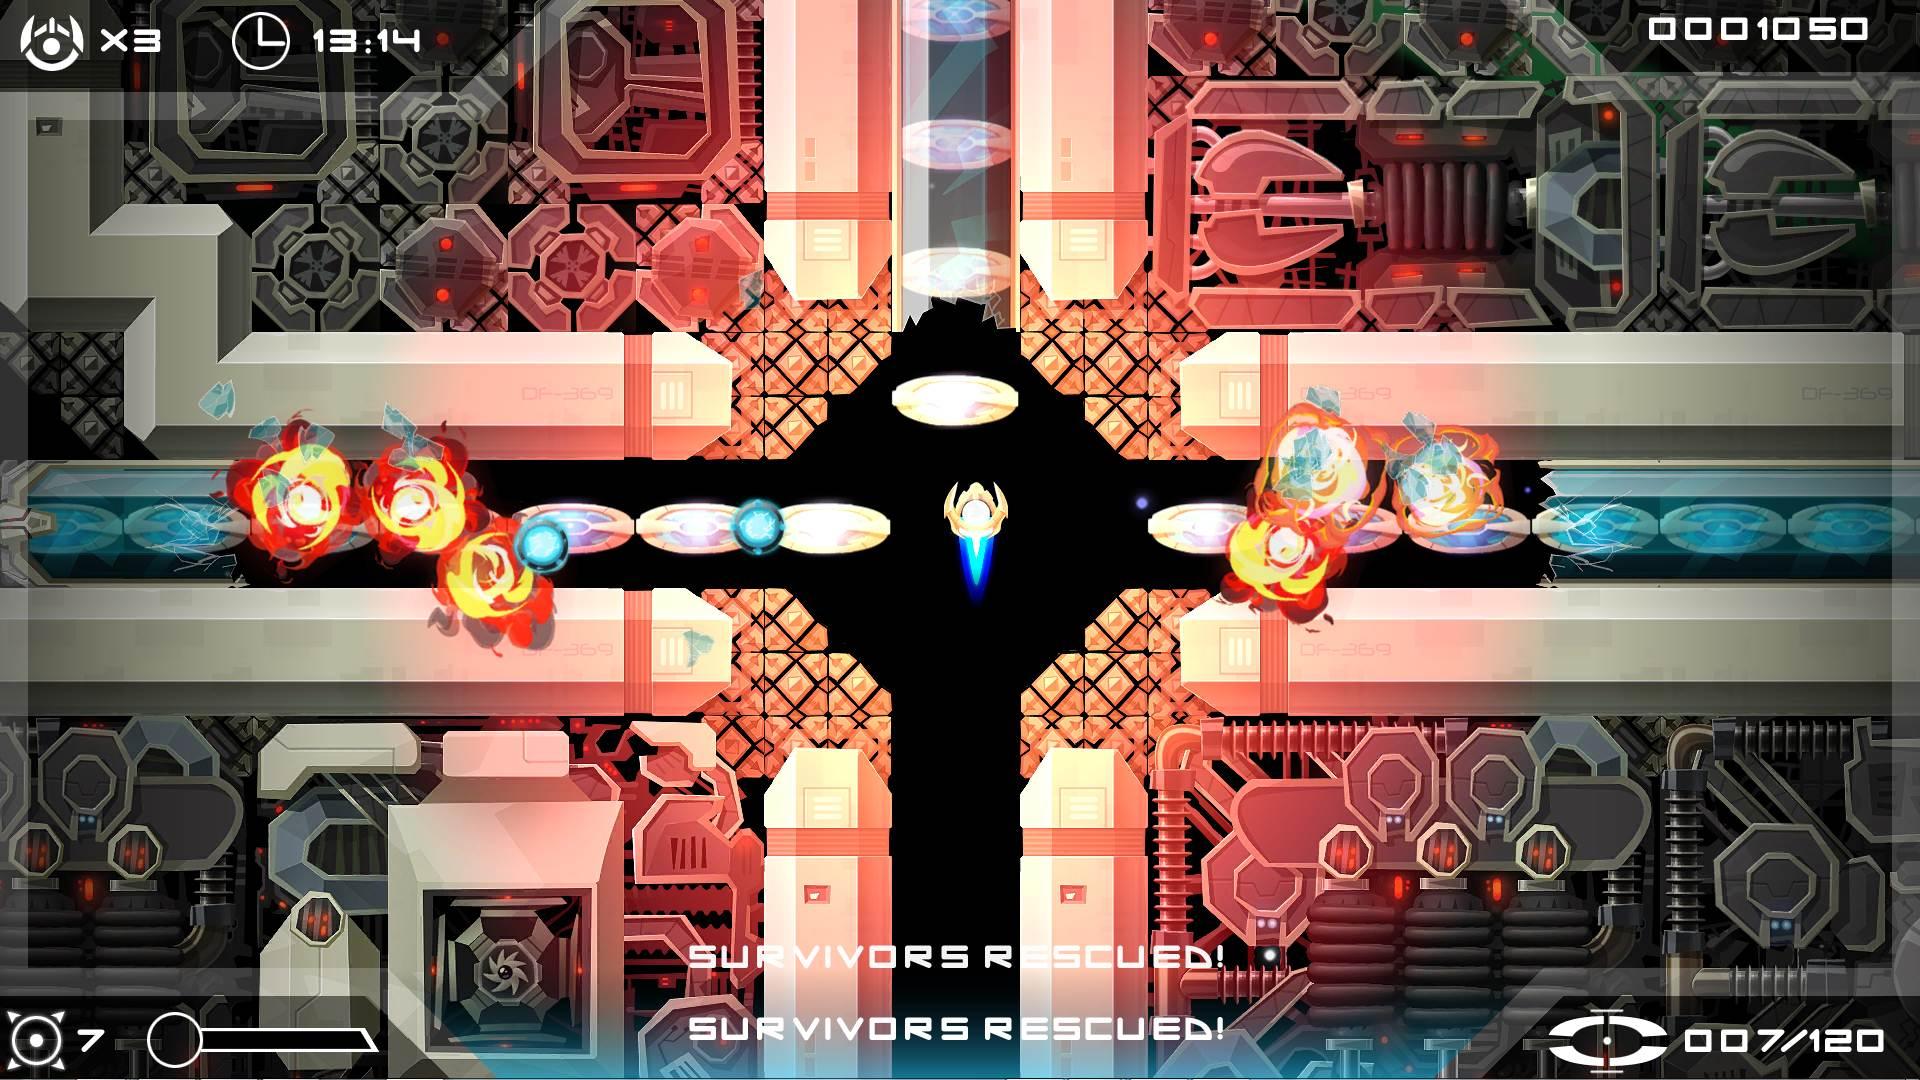 VelocityUltra - Soundtrack screenshot